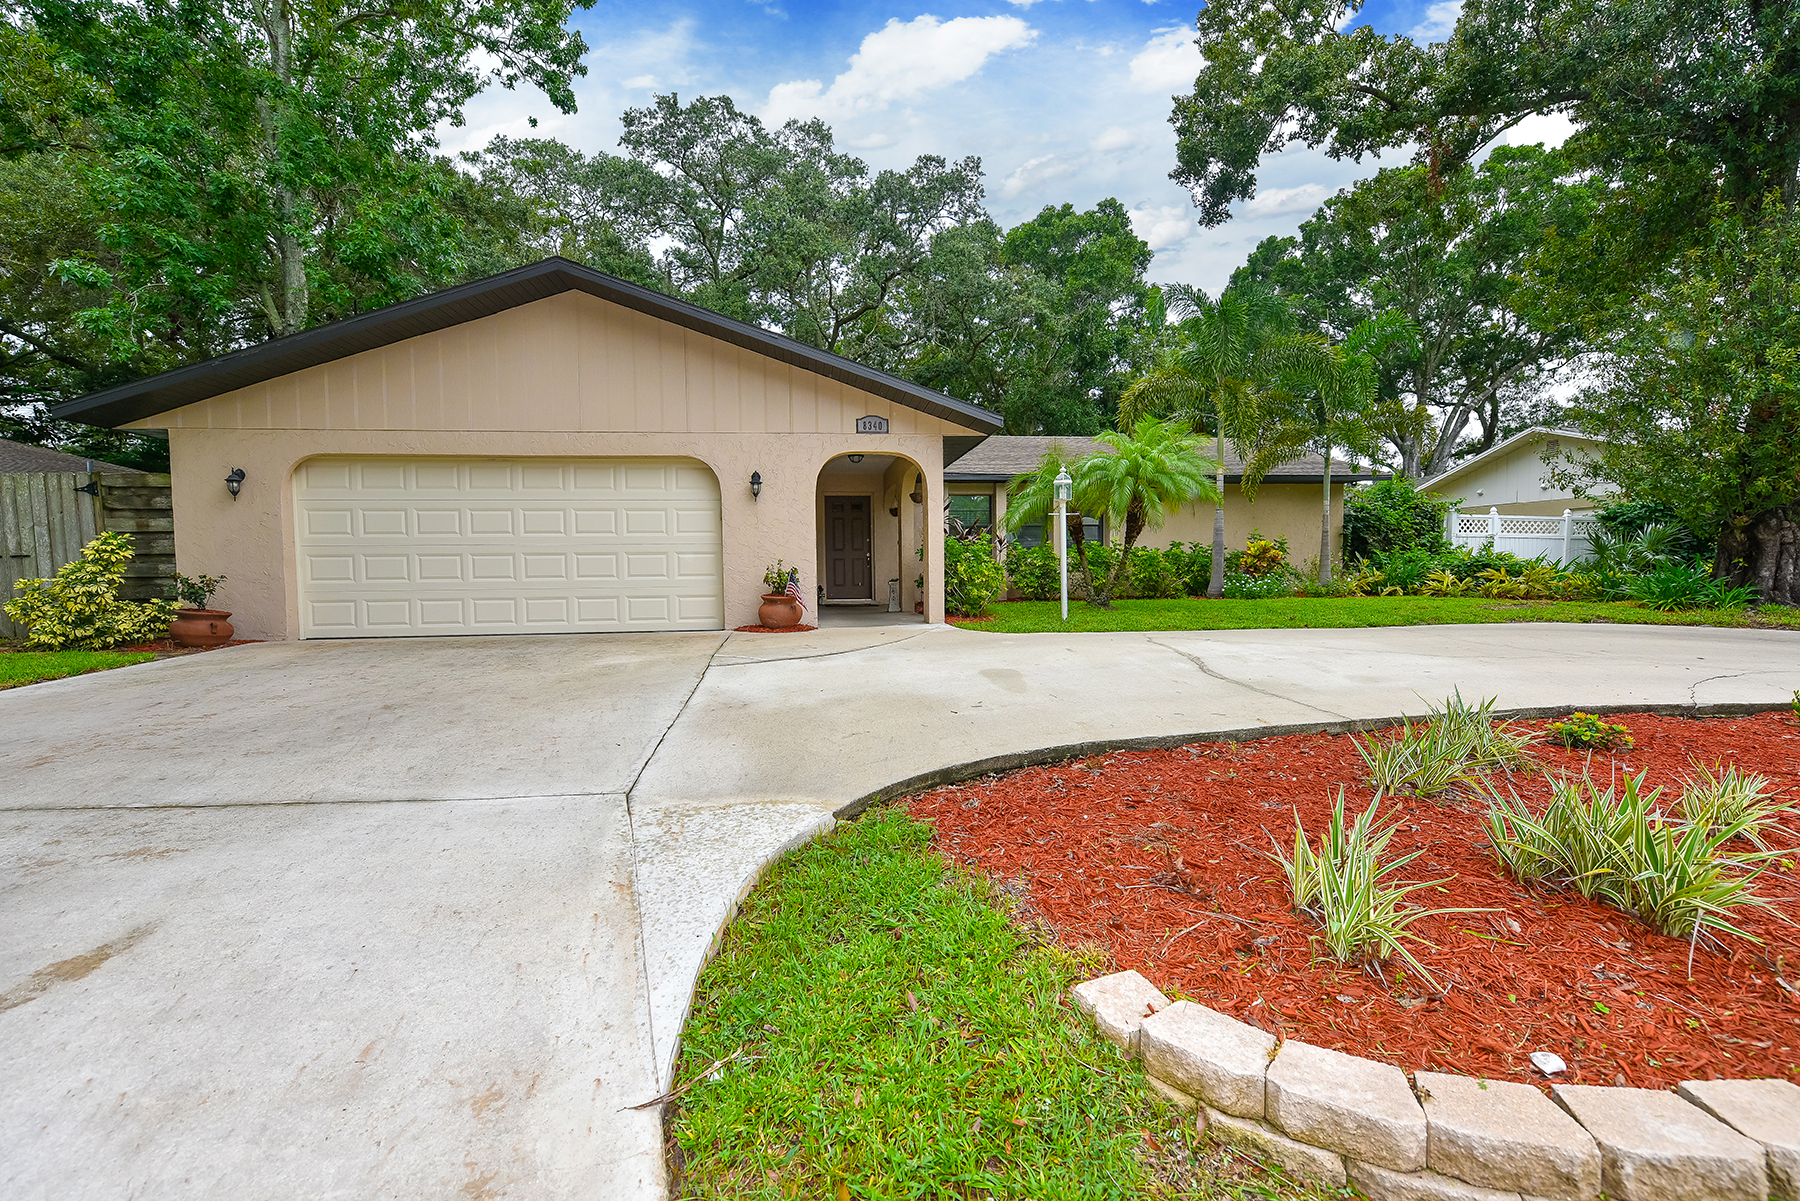 Single Family Home for Sale at UNIVERSITY PINES 8340 Brandeis Cir W Sarasota, Florida, 34243 United States